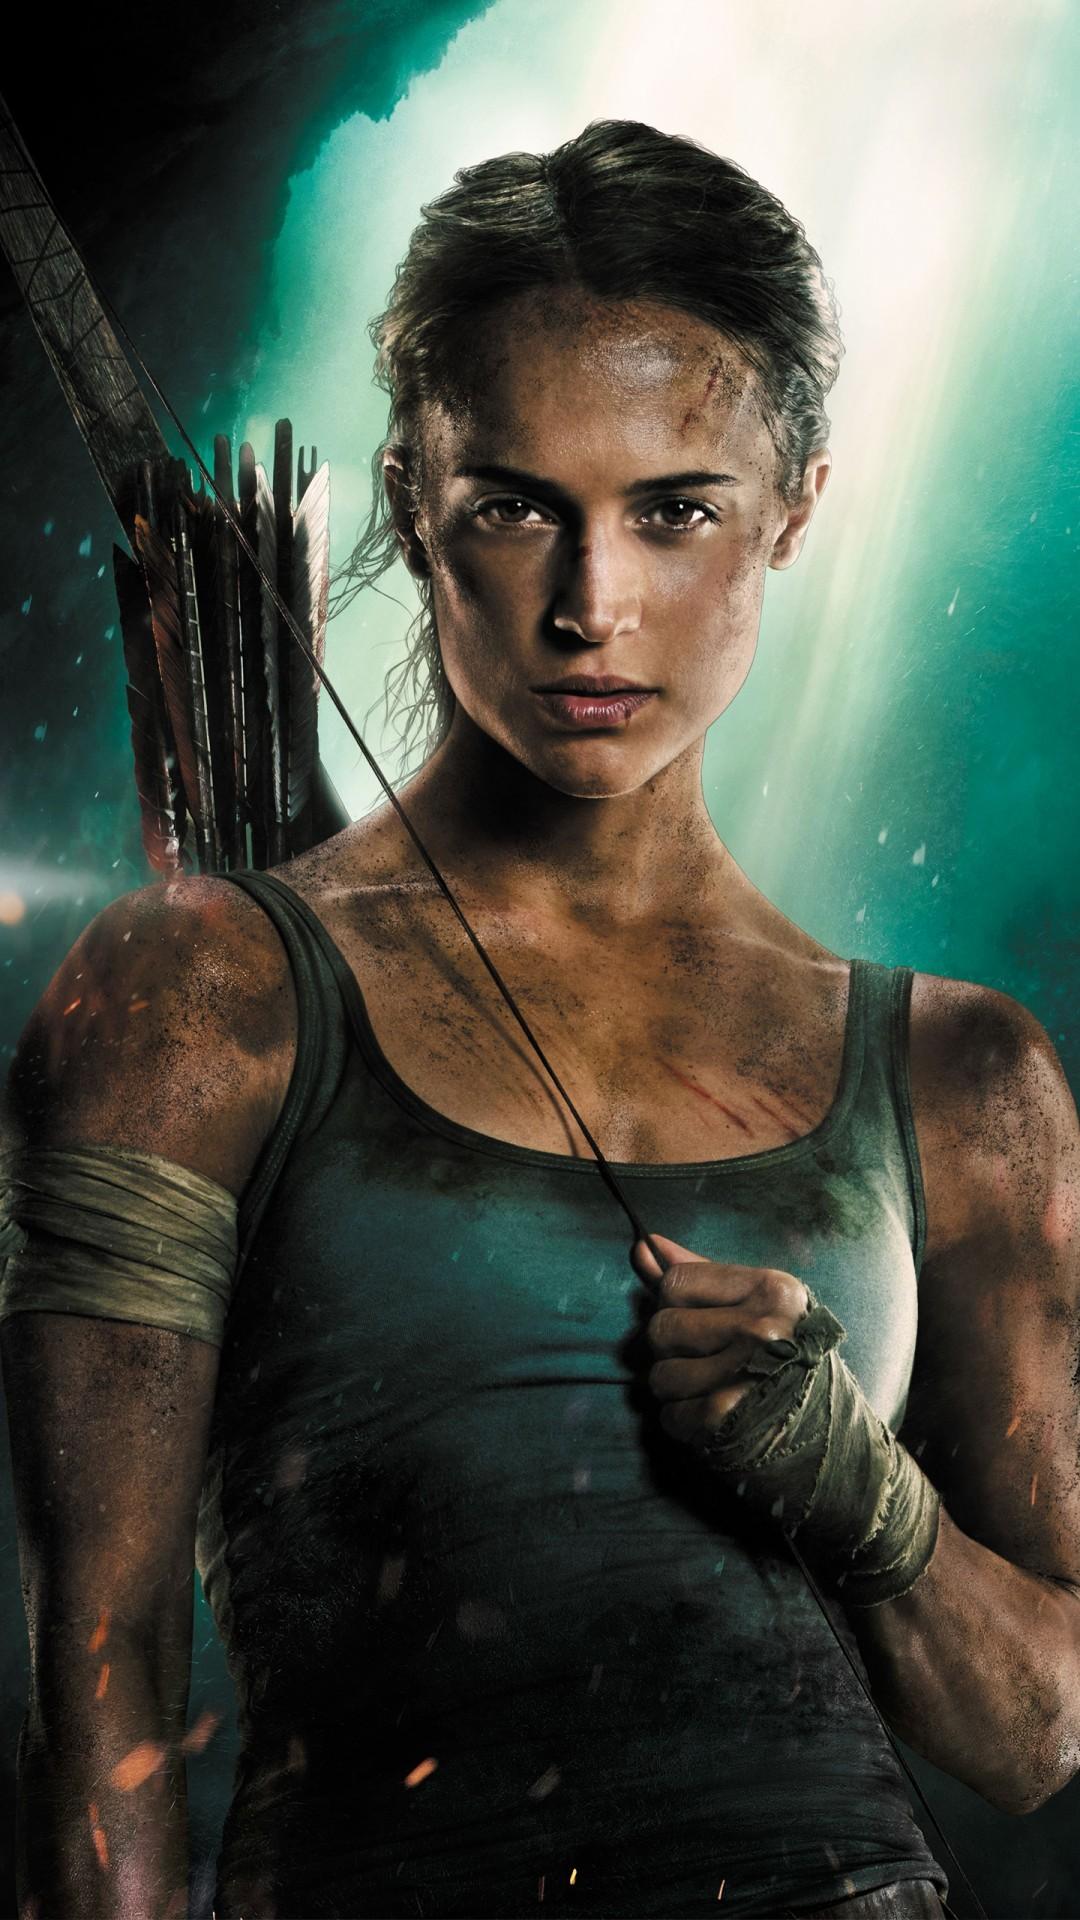 Free Alicia Vikander Lara Croft Tomb Raider phone wallpaper by chubbs269